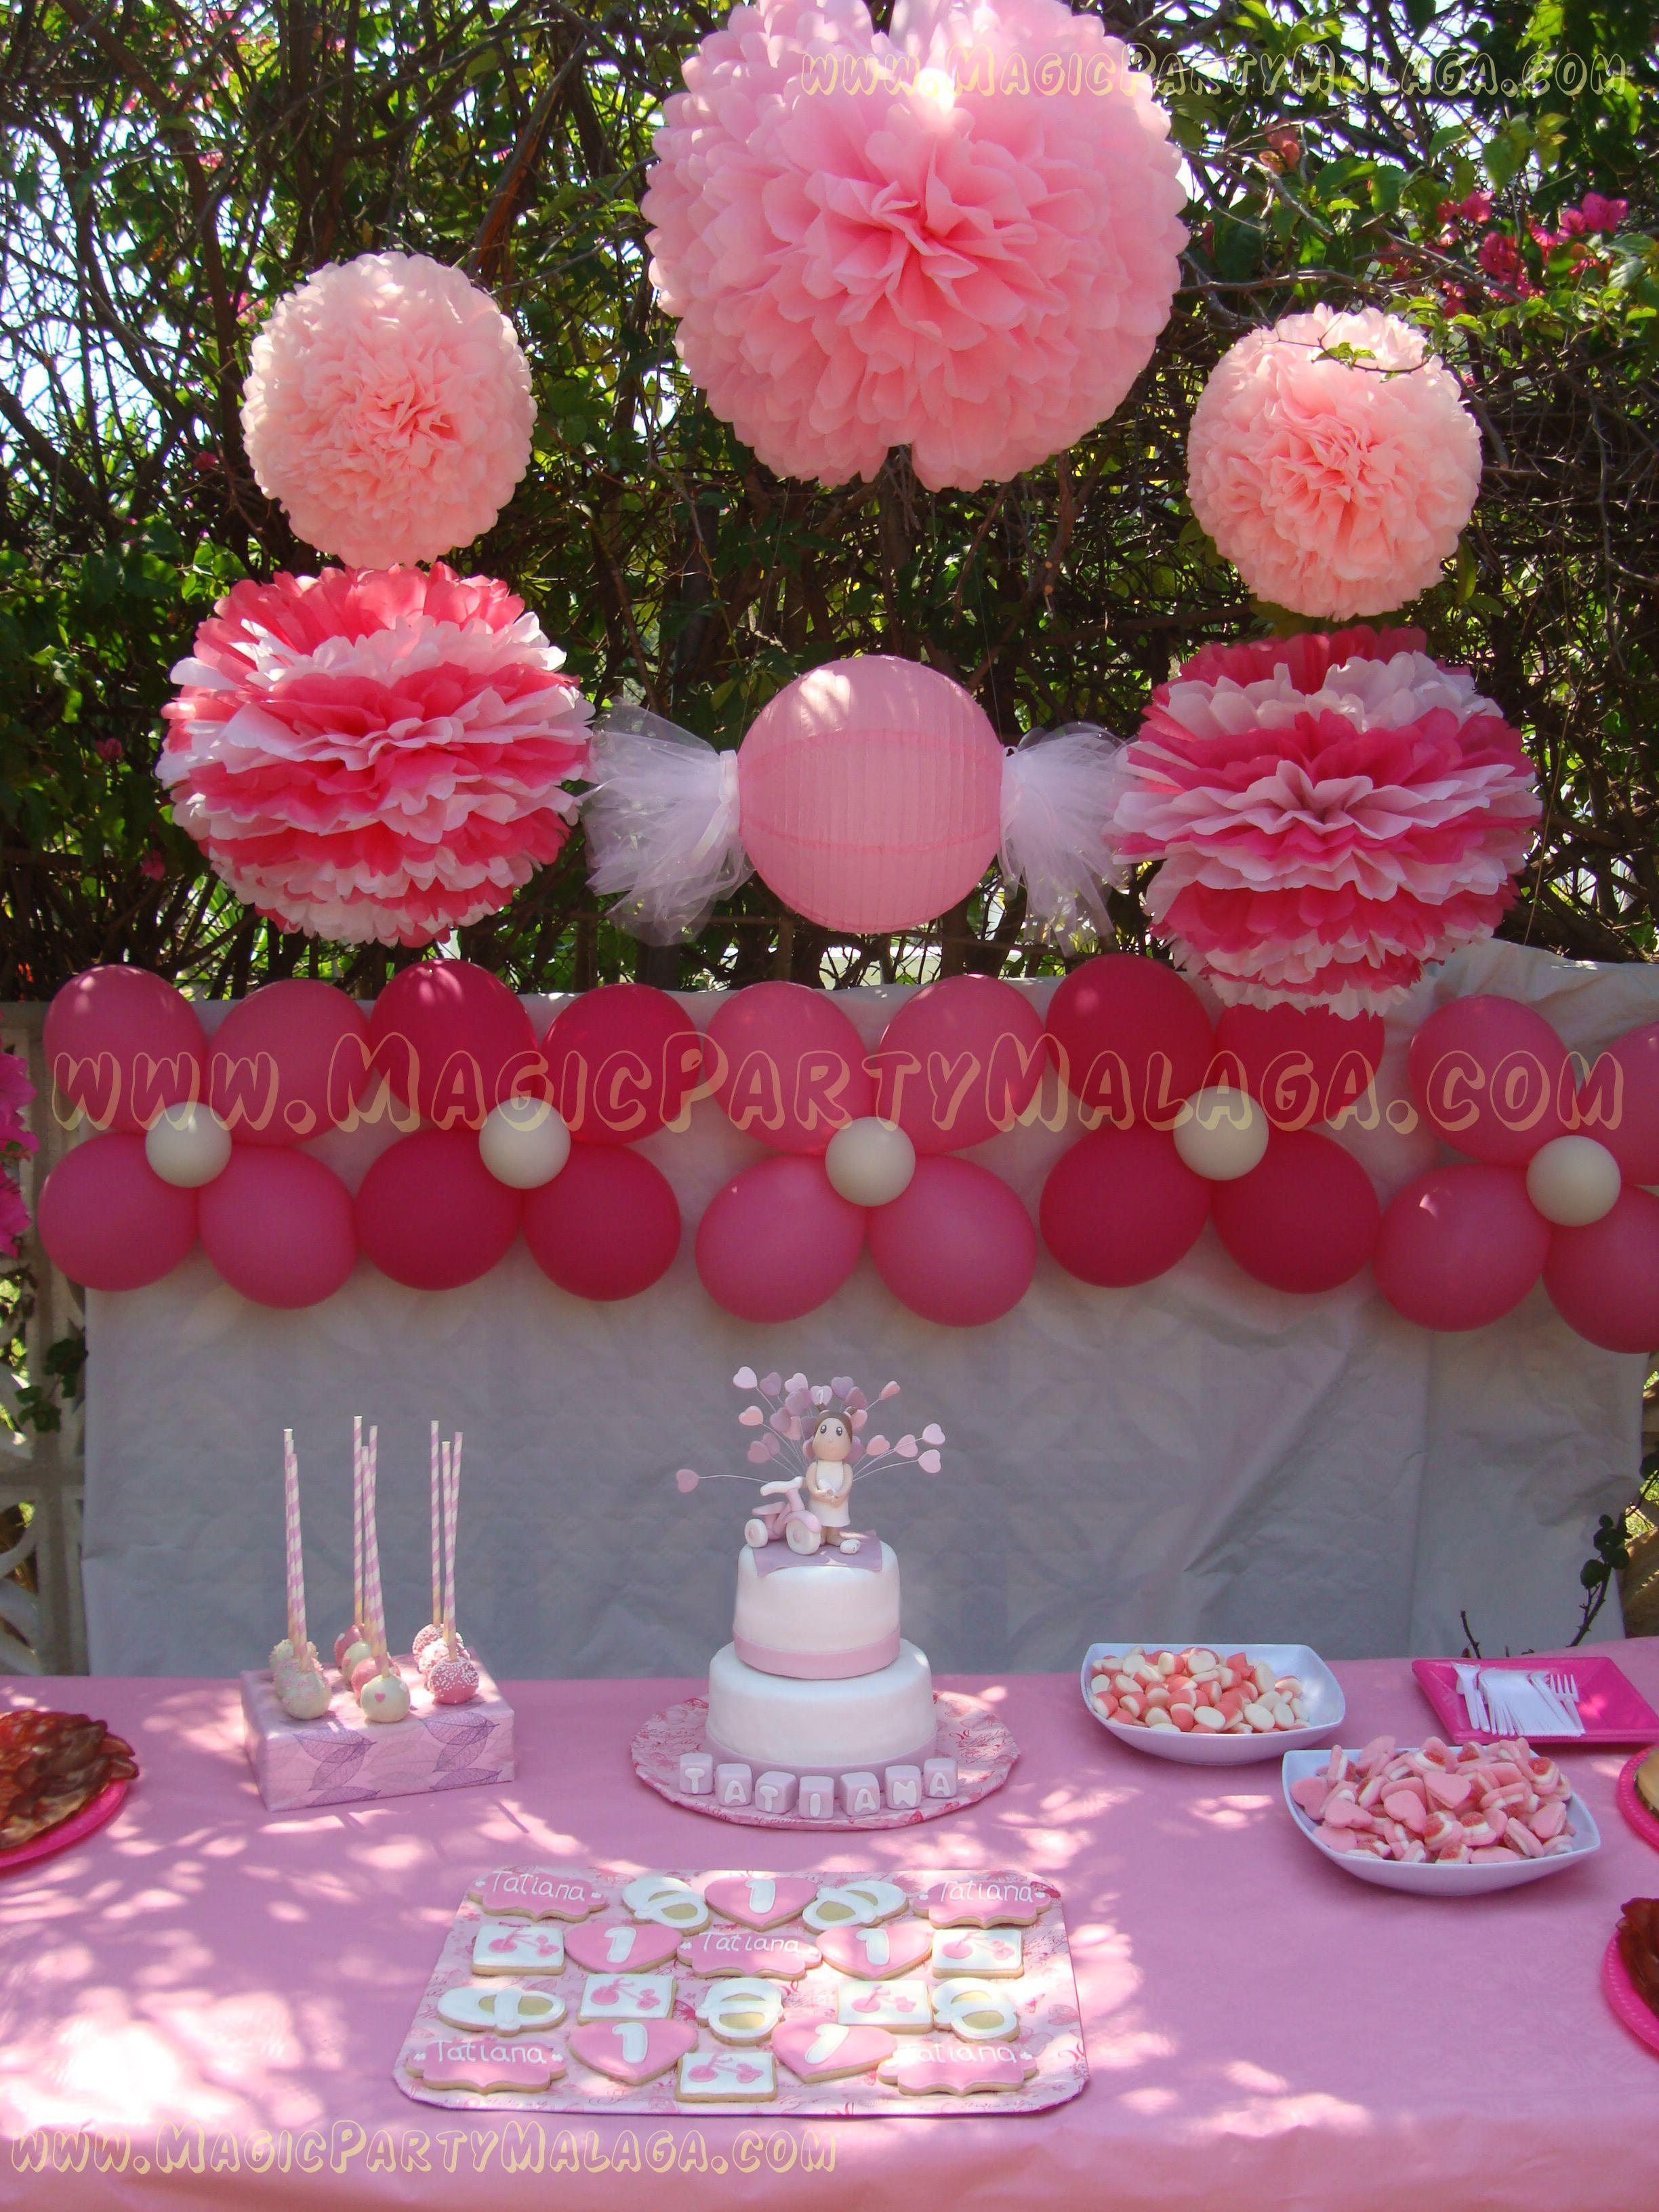 Cumplea os 1 a o fiesta al aire libre con mesa dulce con - Decoracion cumpleanos bebe 1 ano ...